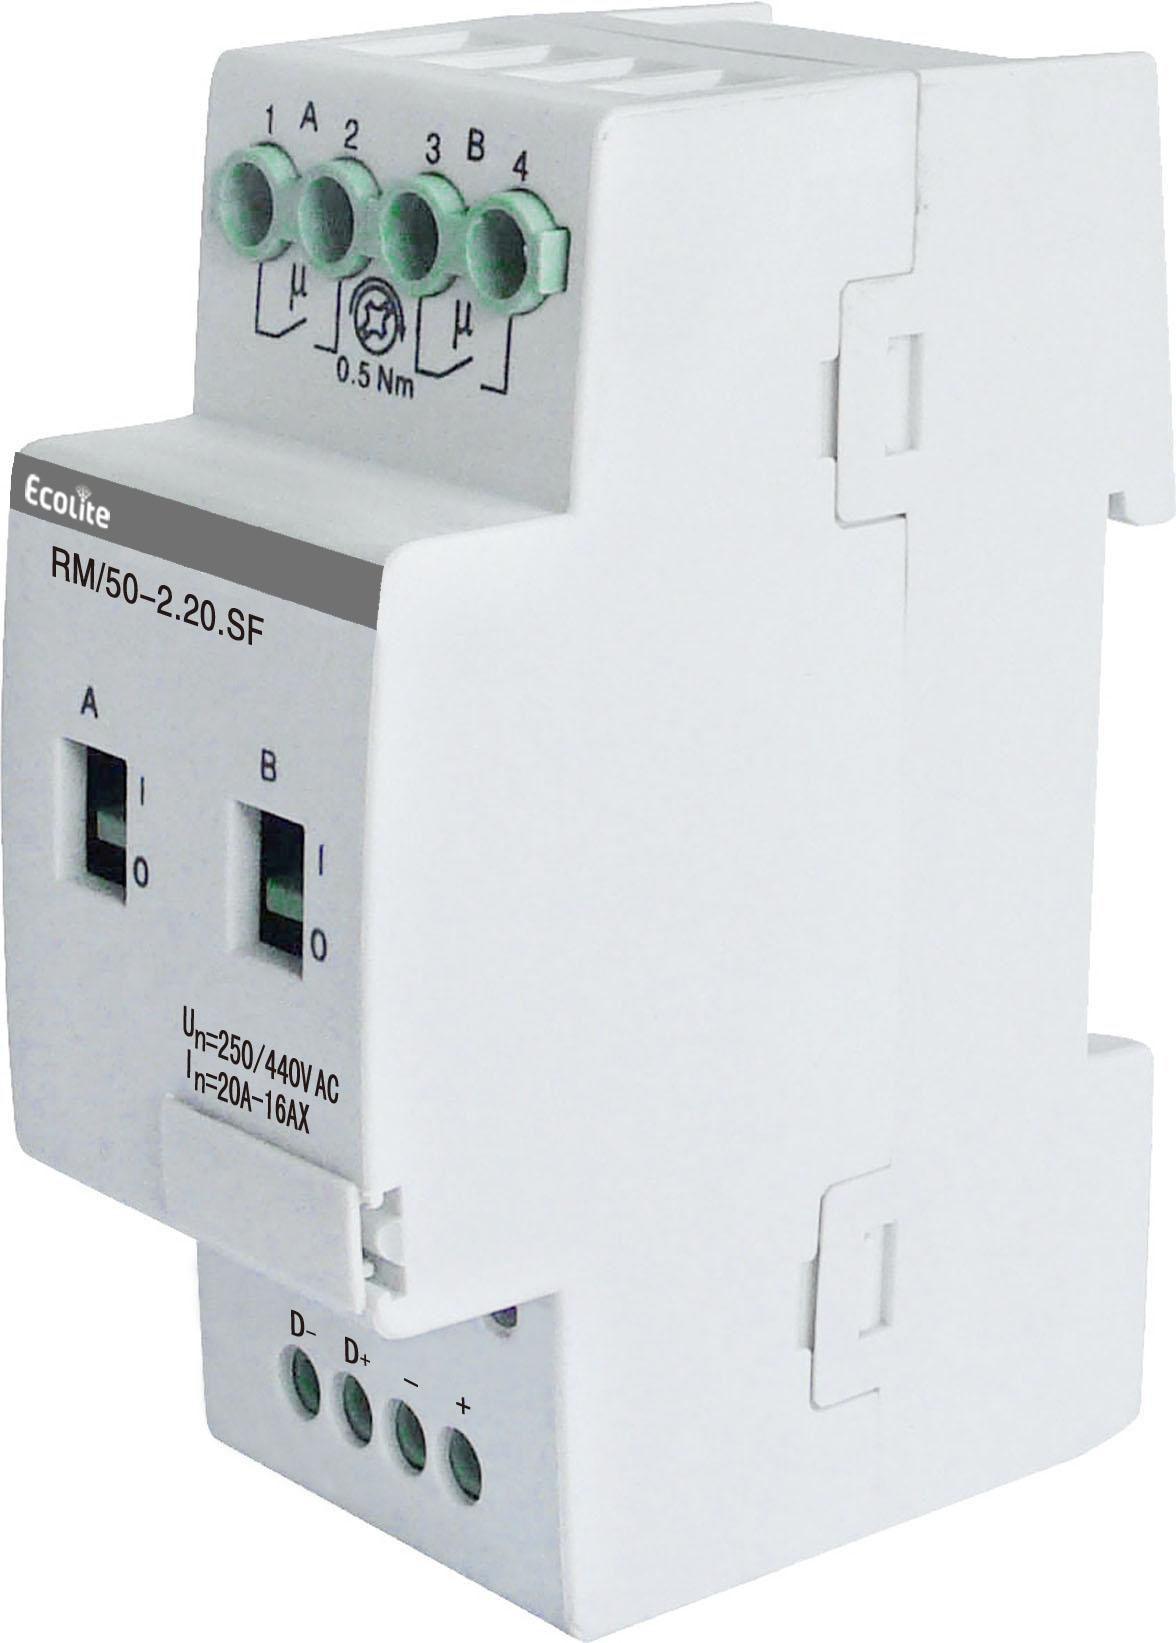 Intelligent lighting switch controller